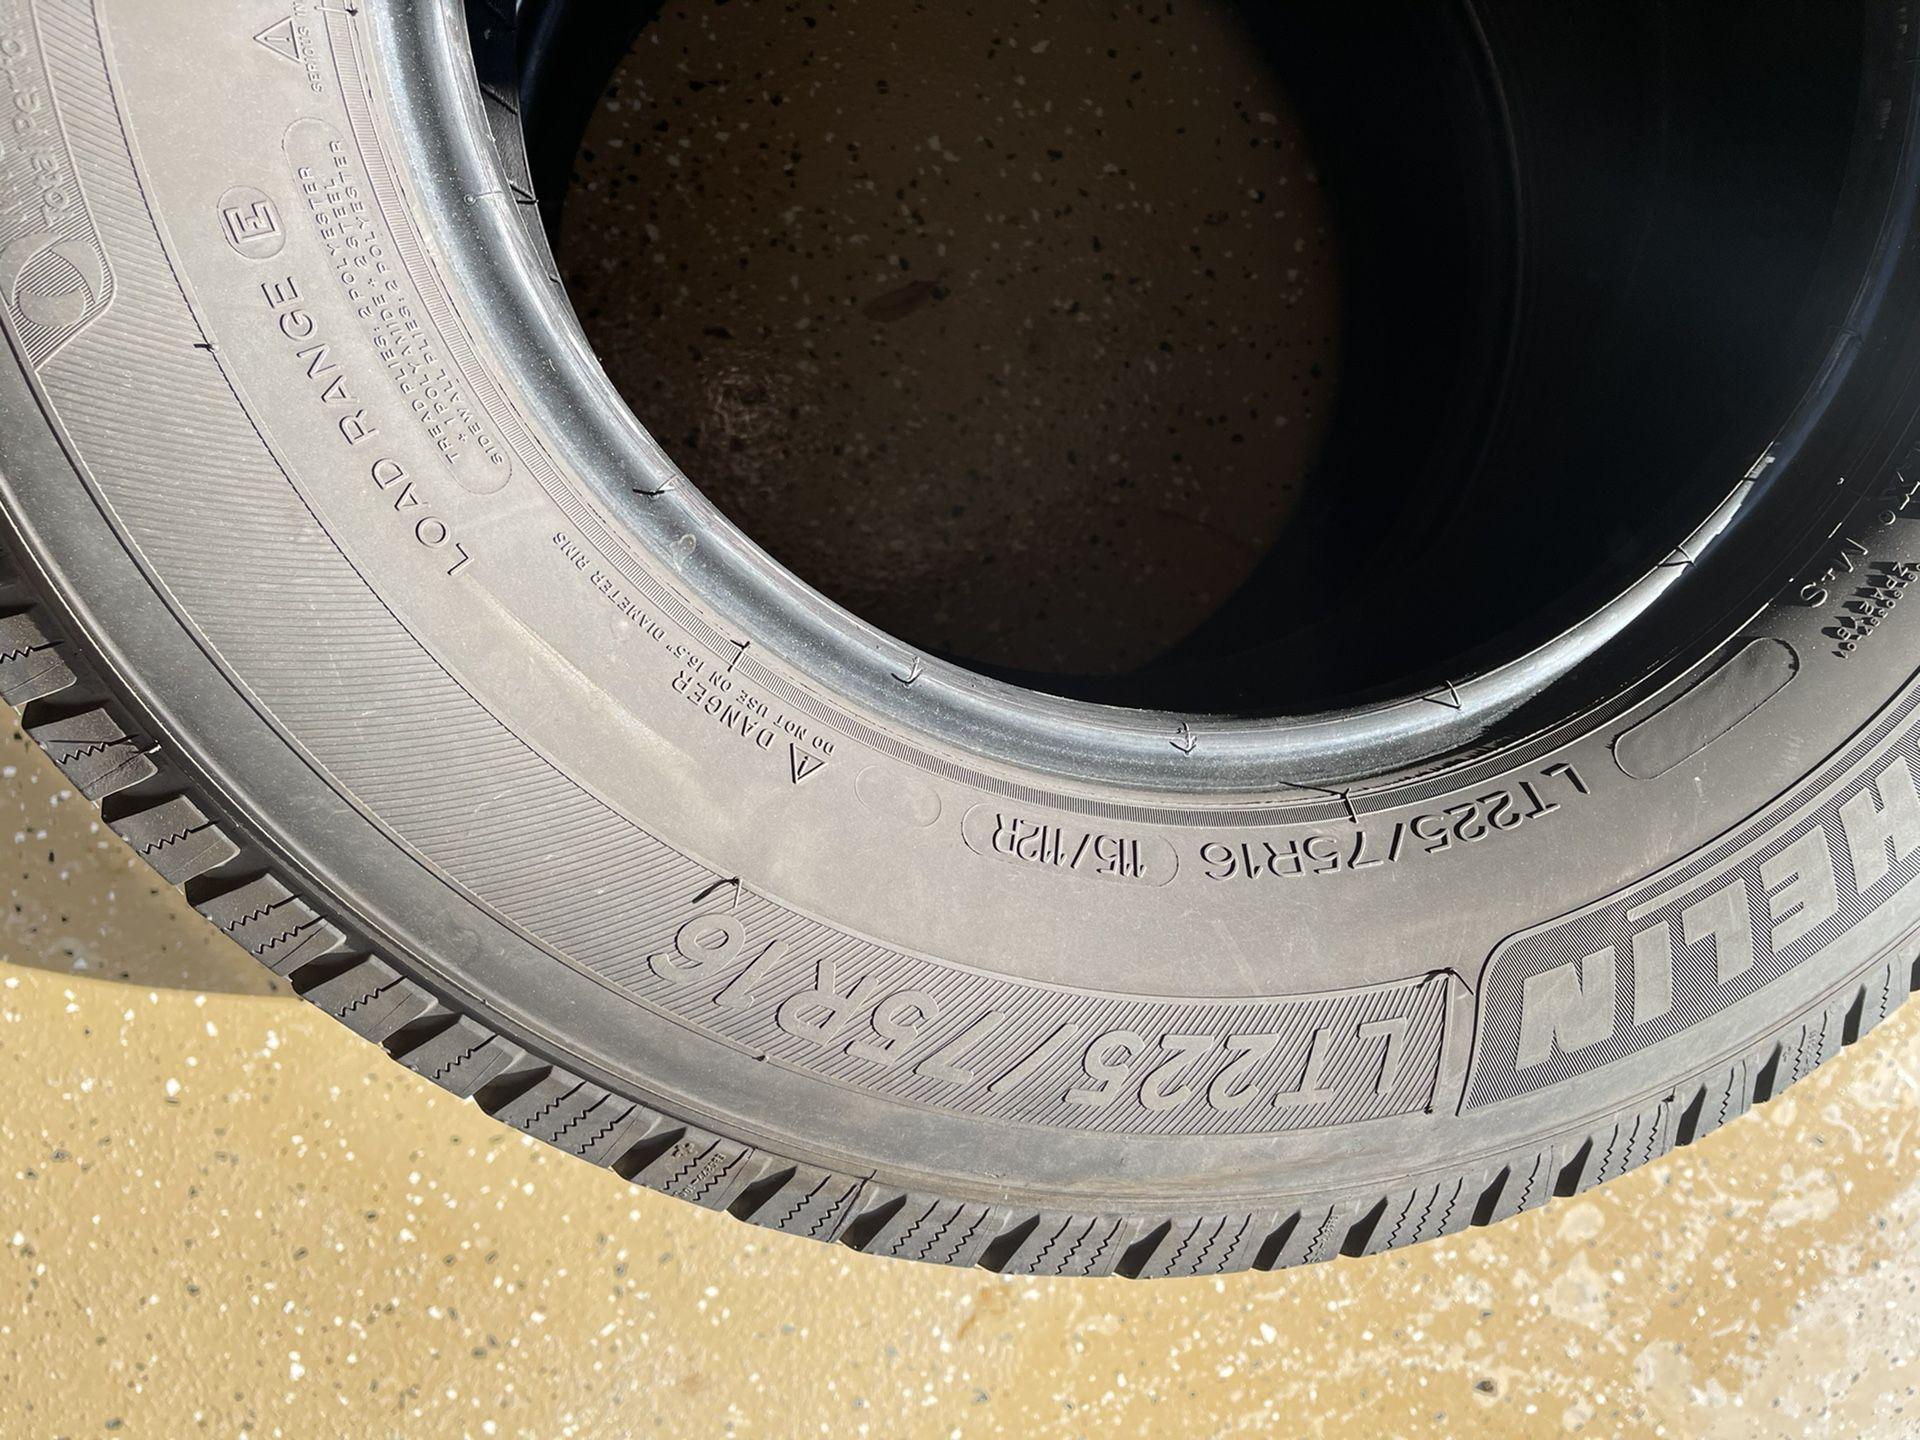 Michelin Defender LT225/75R16 Pair